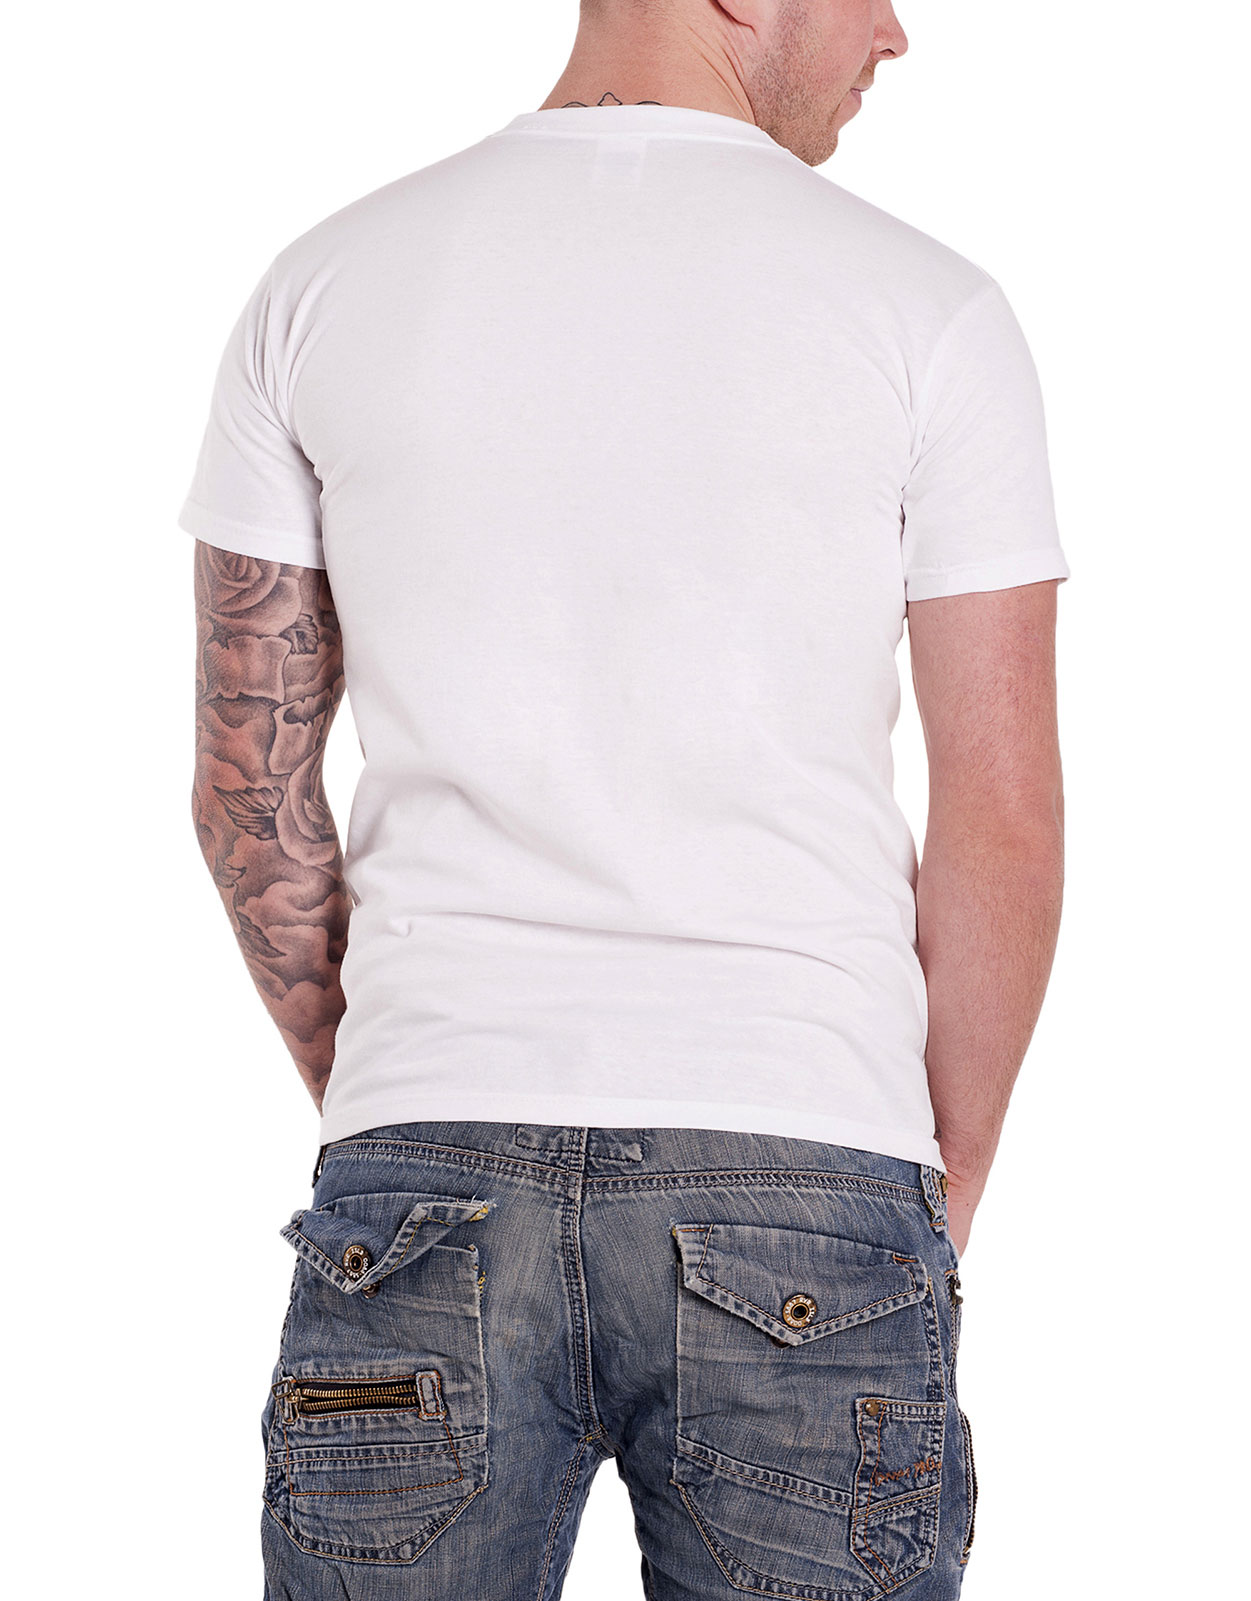 Camiseta-Last-Jedi-De-Star-Wars-Movie-Poster-porgs-Guardia-pretoriana-oficial-para-hombre miniatura 13